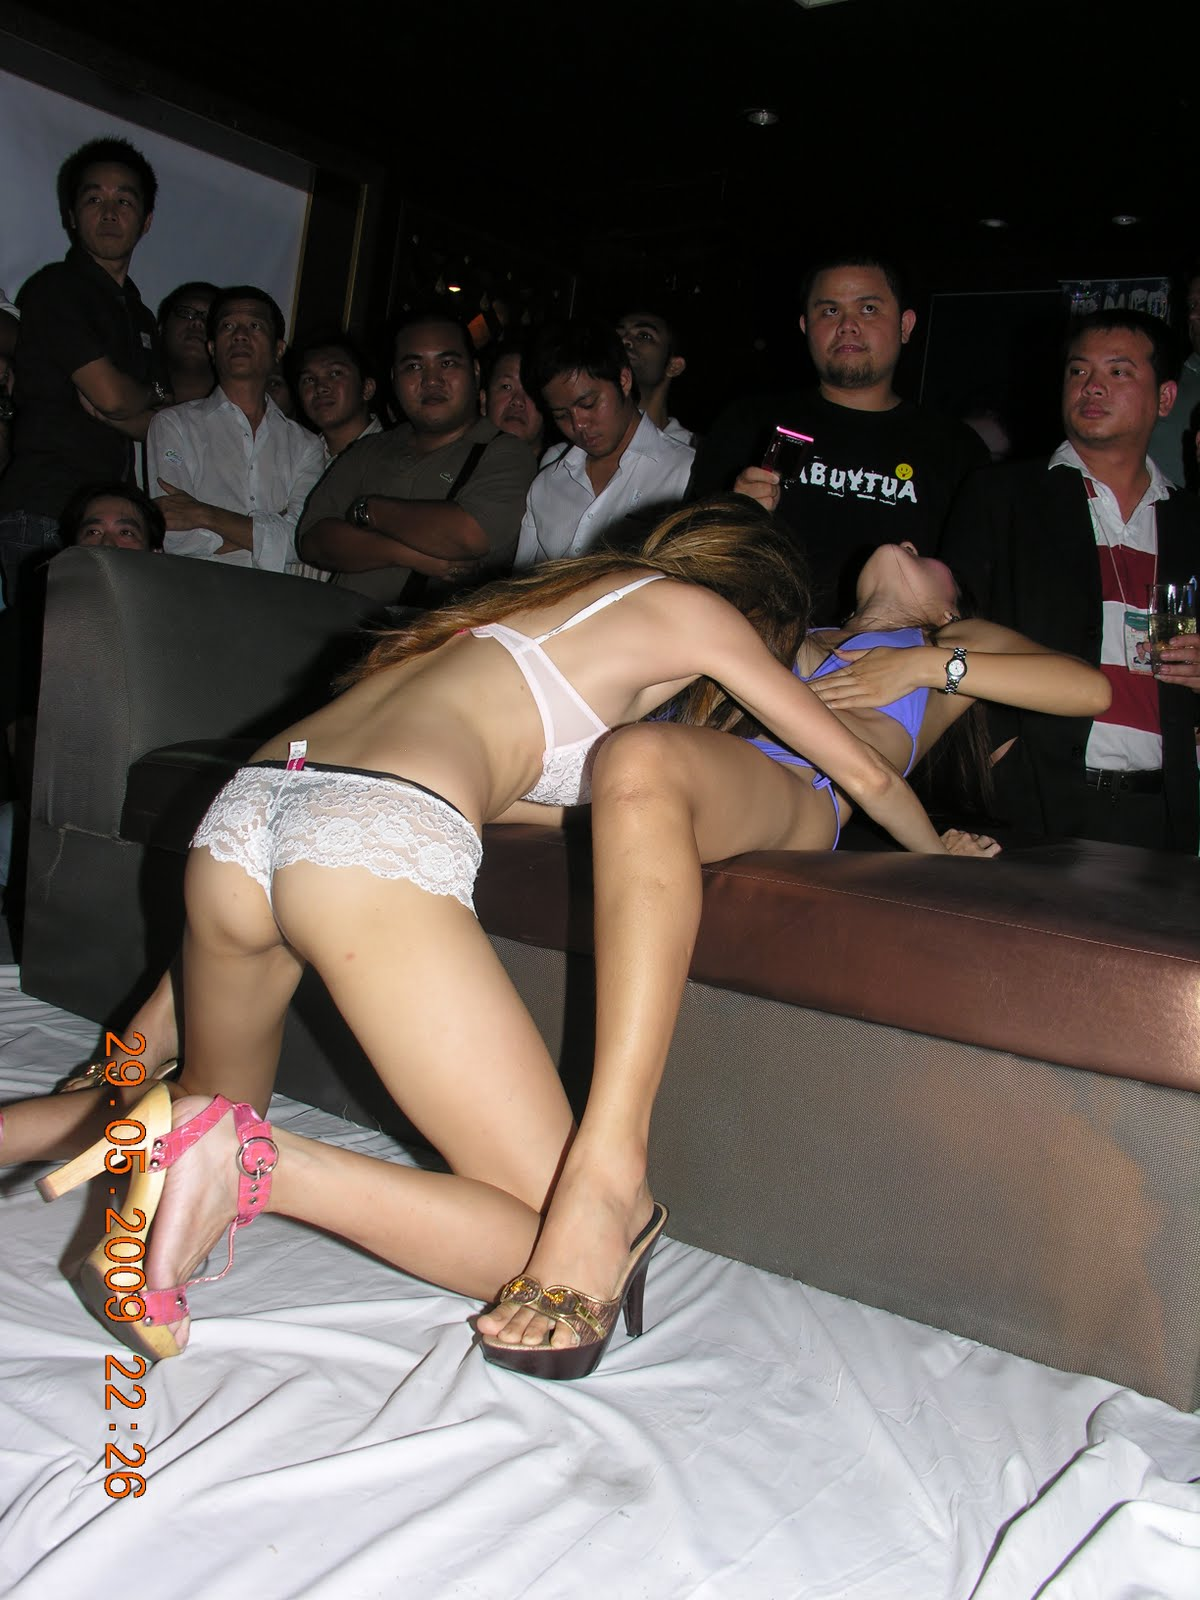 Taiwan girl show 22 - 2 part 2